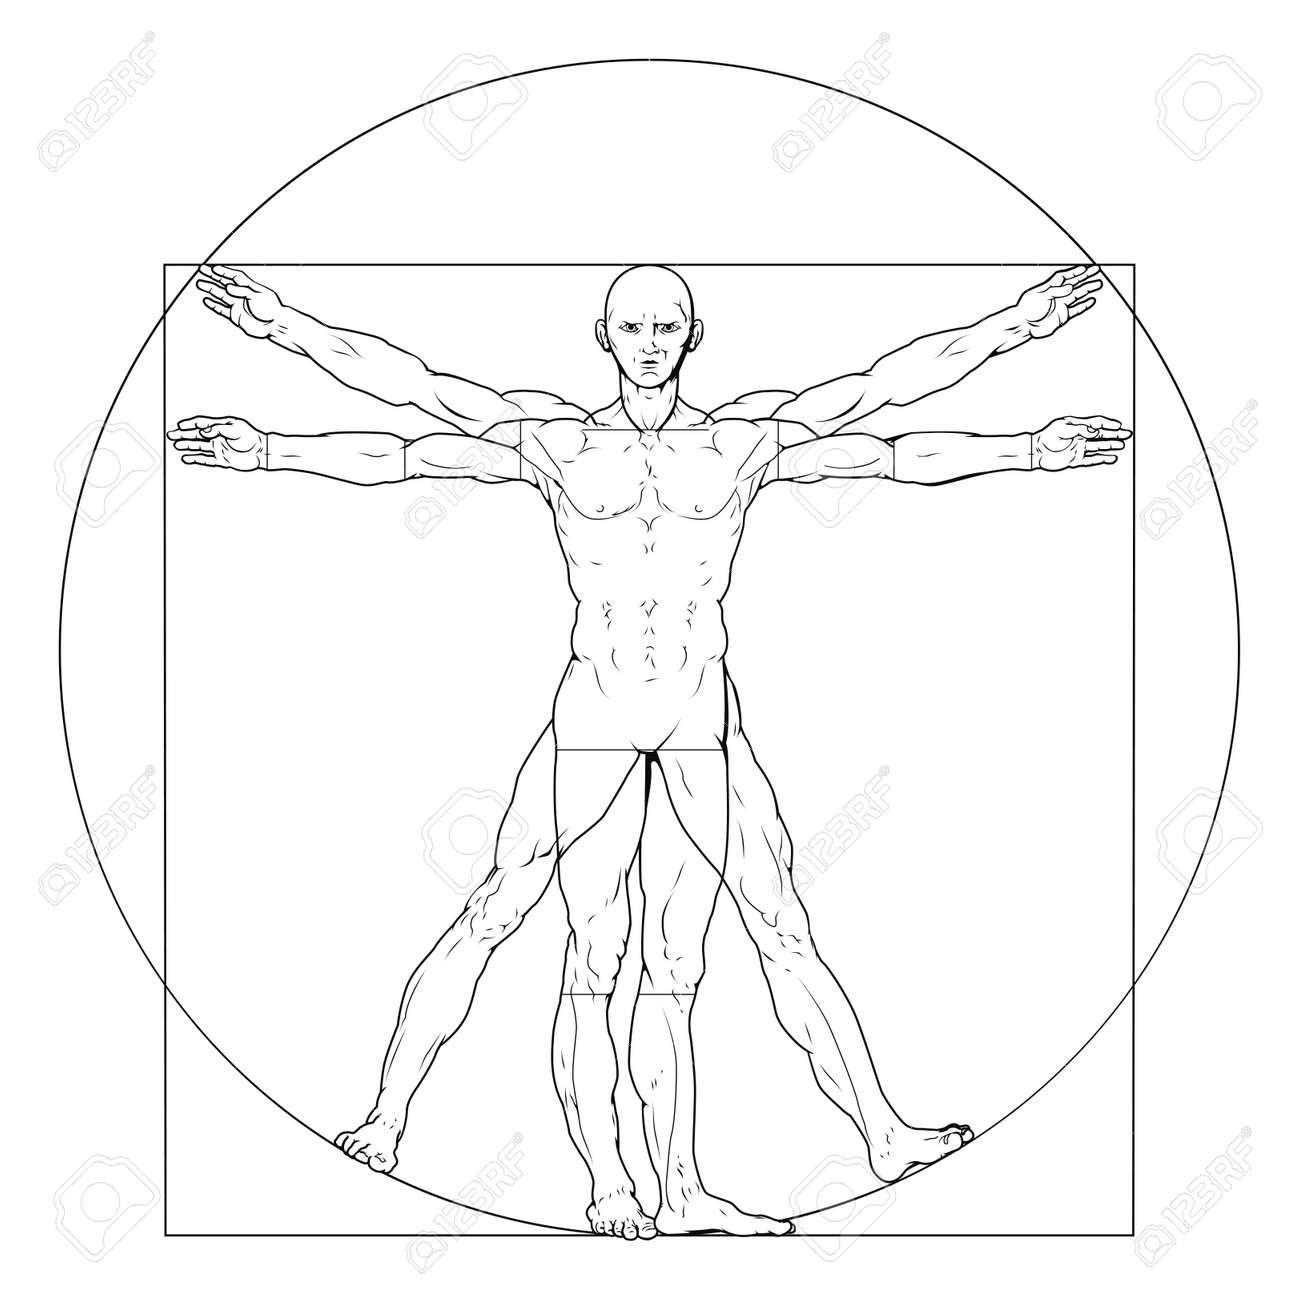 Illustration Based On Leonardo Da Vincis Classic Vitruvian Man